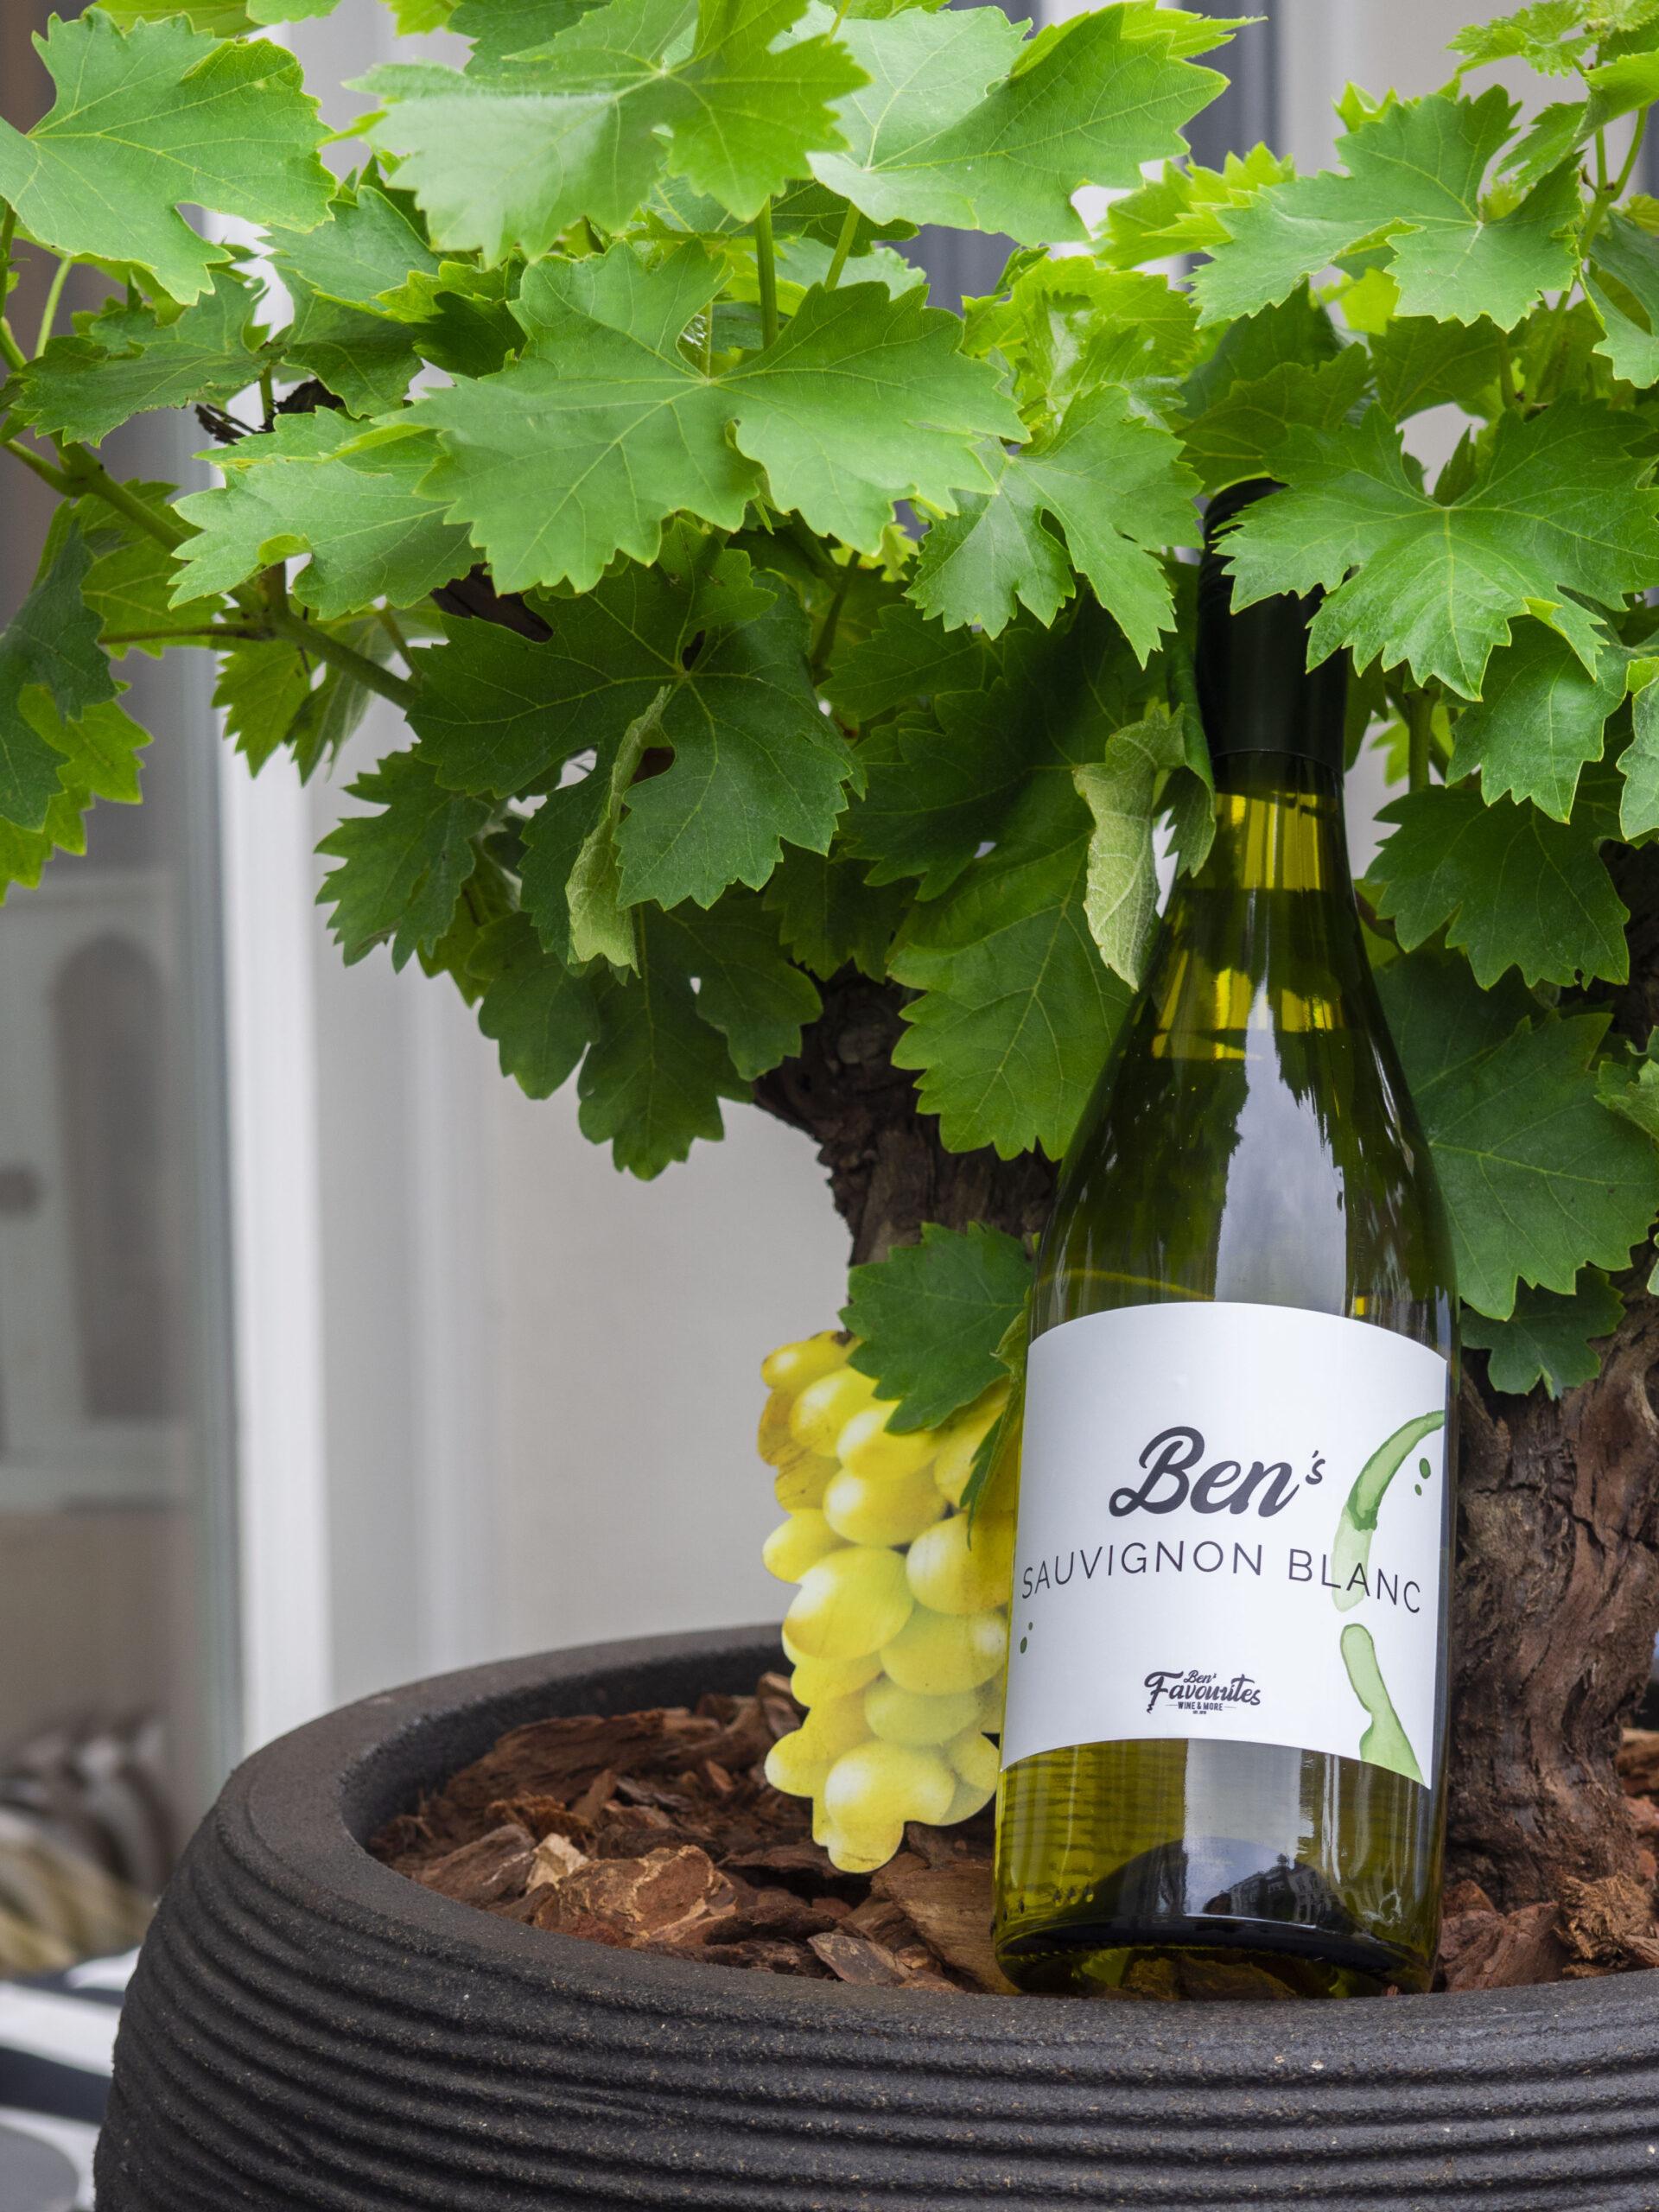 ben's favourites wine & more den bosch